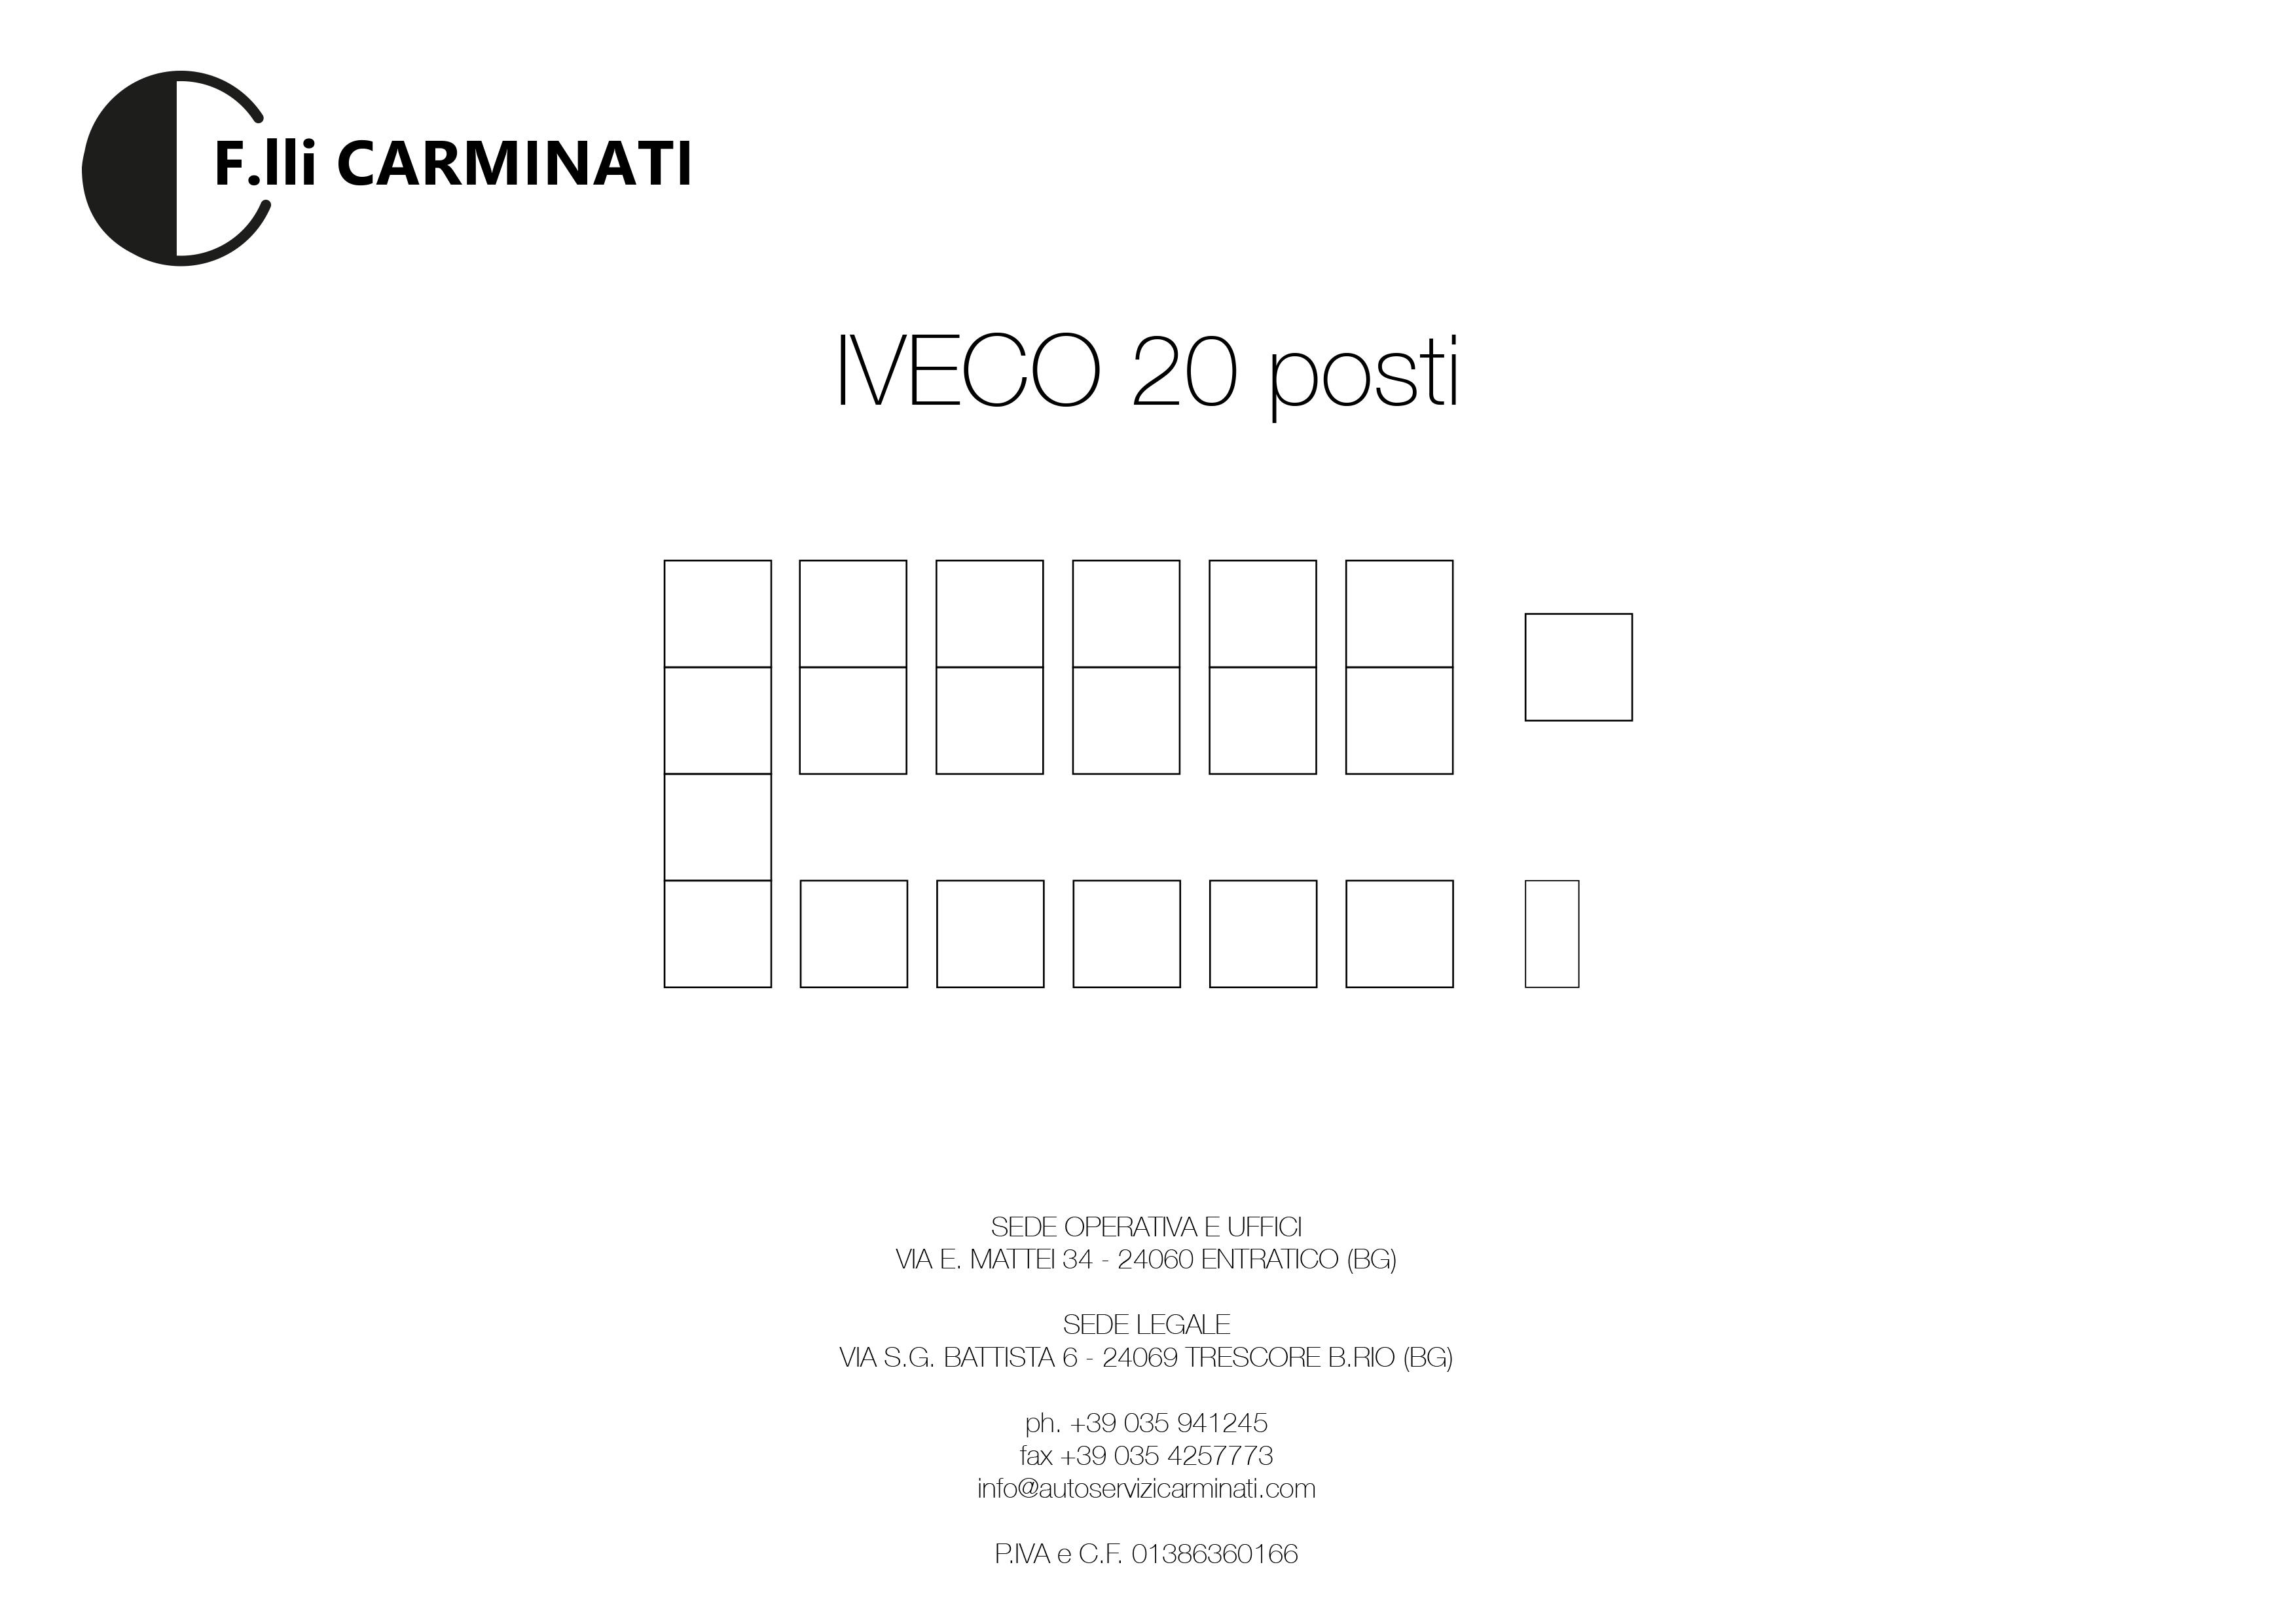 IVECO 20